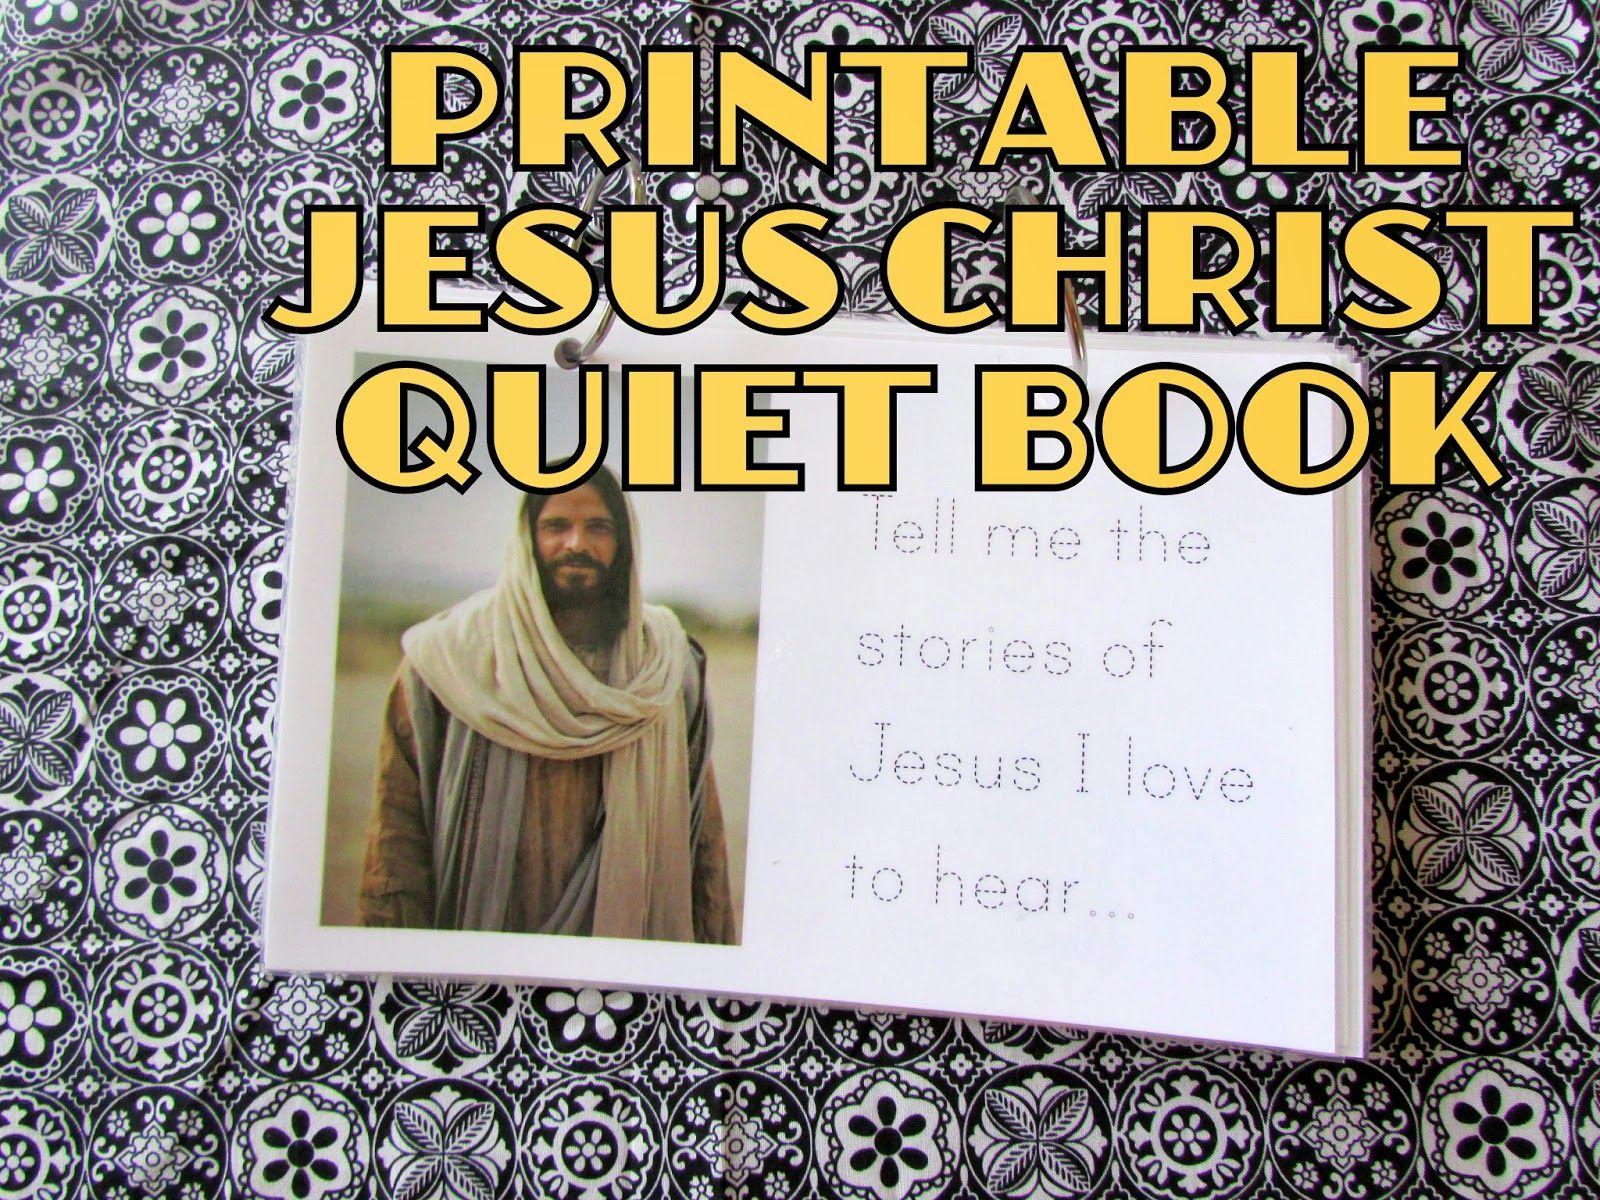 jesus christ flipbook free quiet book printable perfect easy